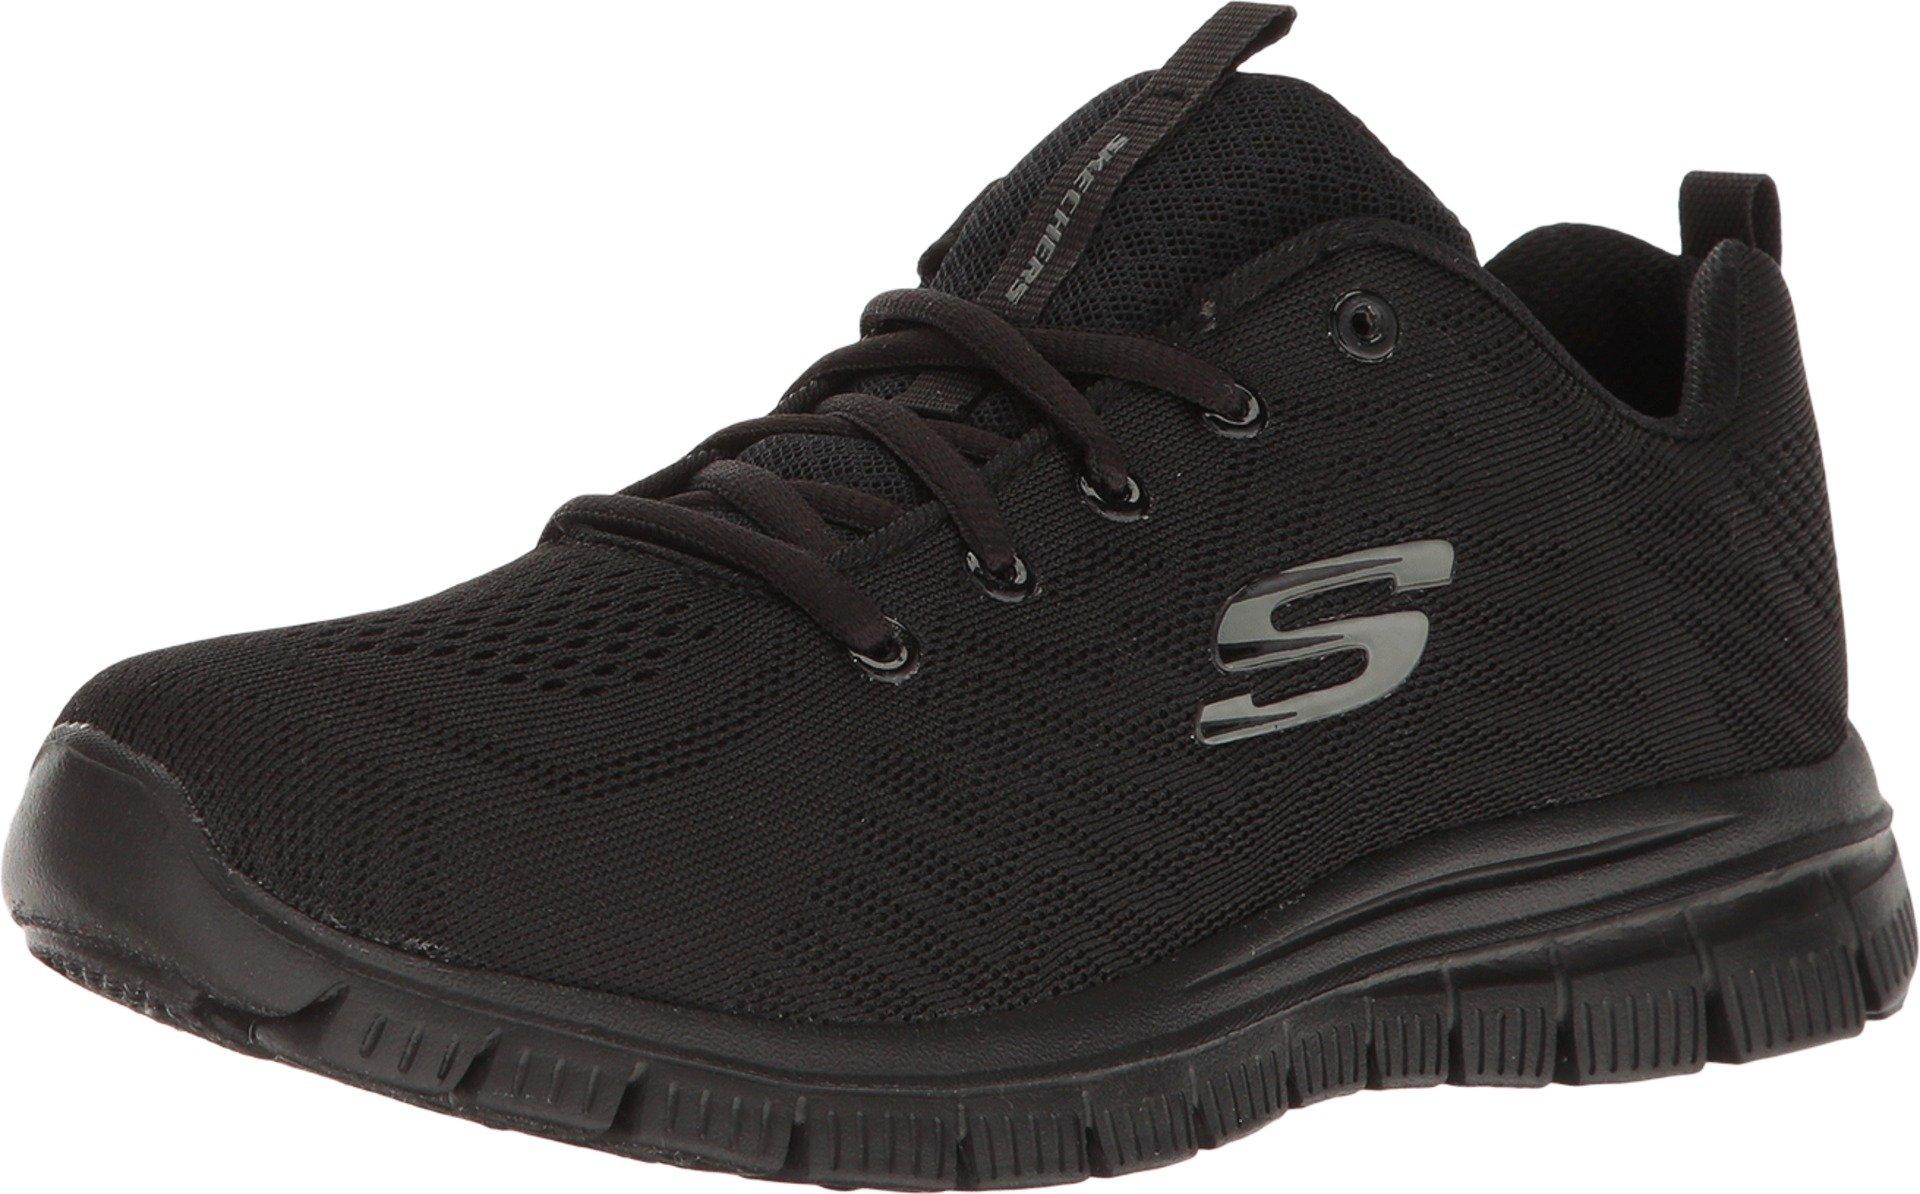 Skechers Sport Graceful Get Connected Women's Sneaker 8 B(M) US Black-Black